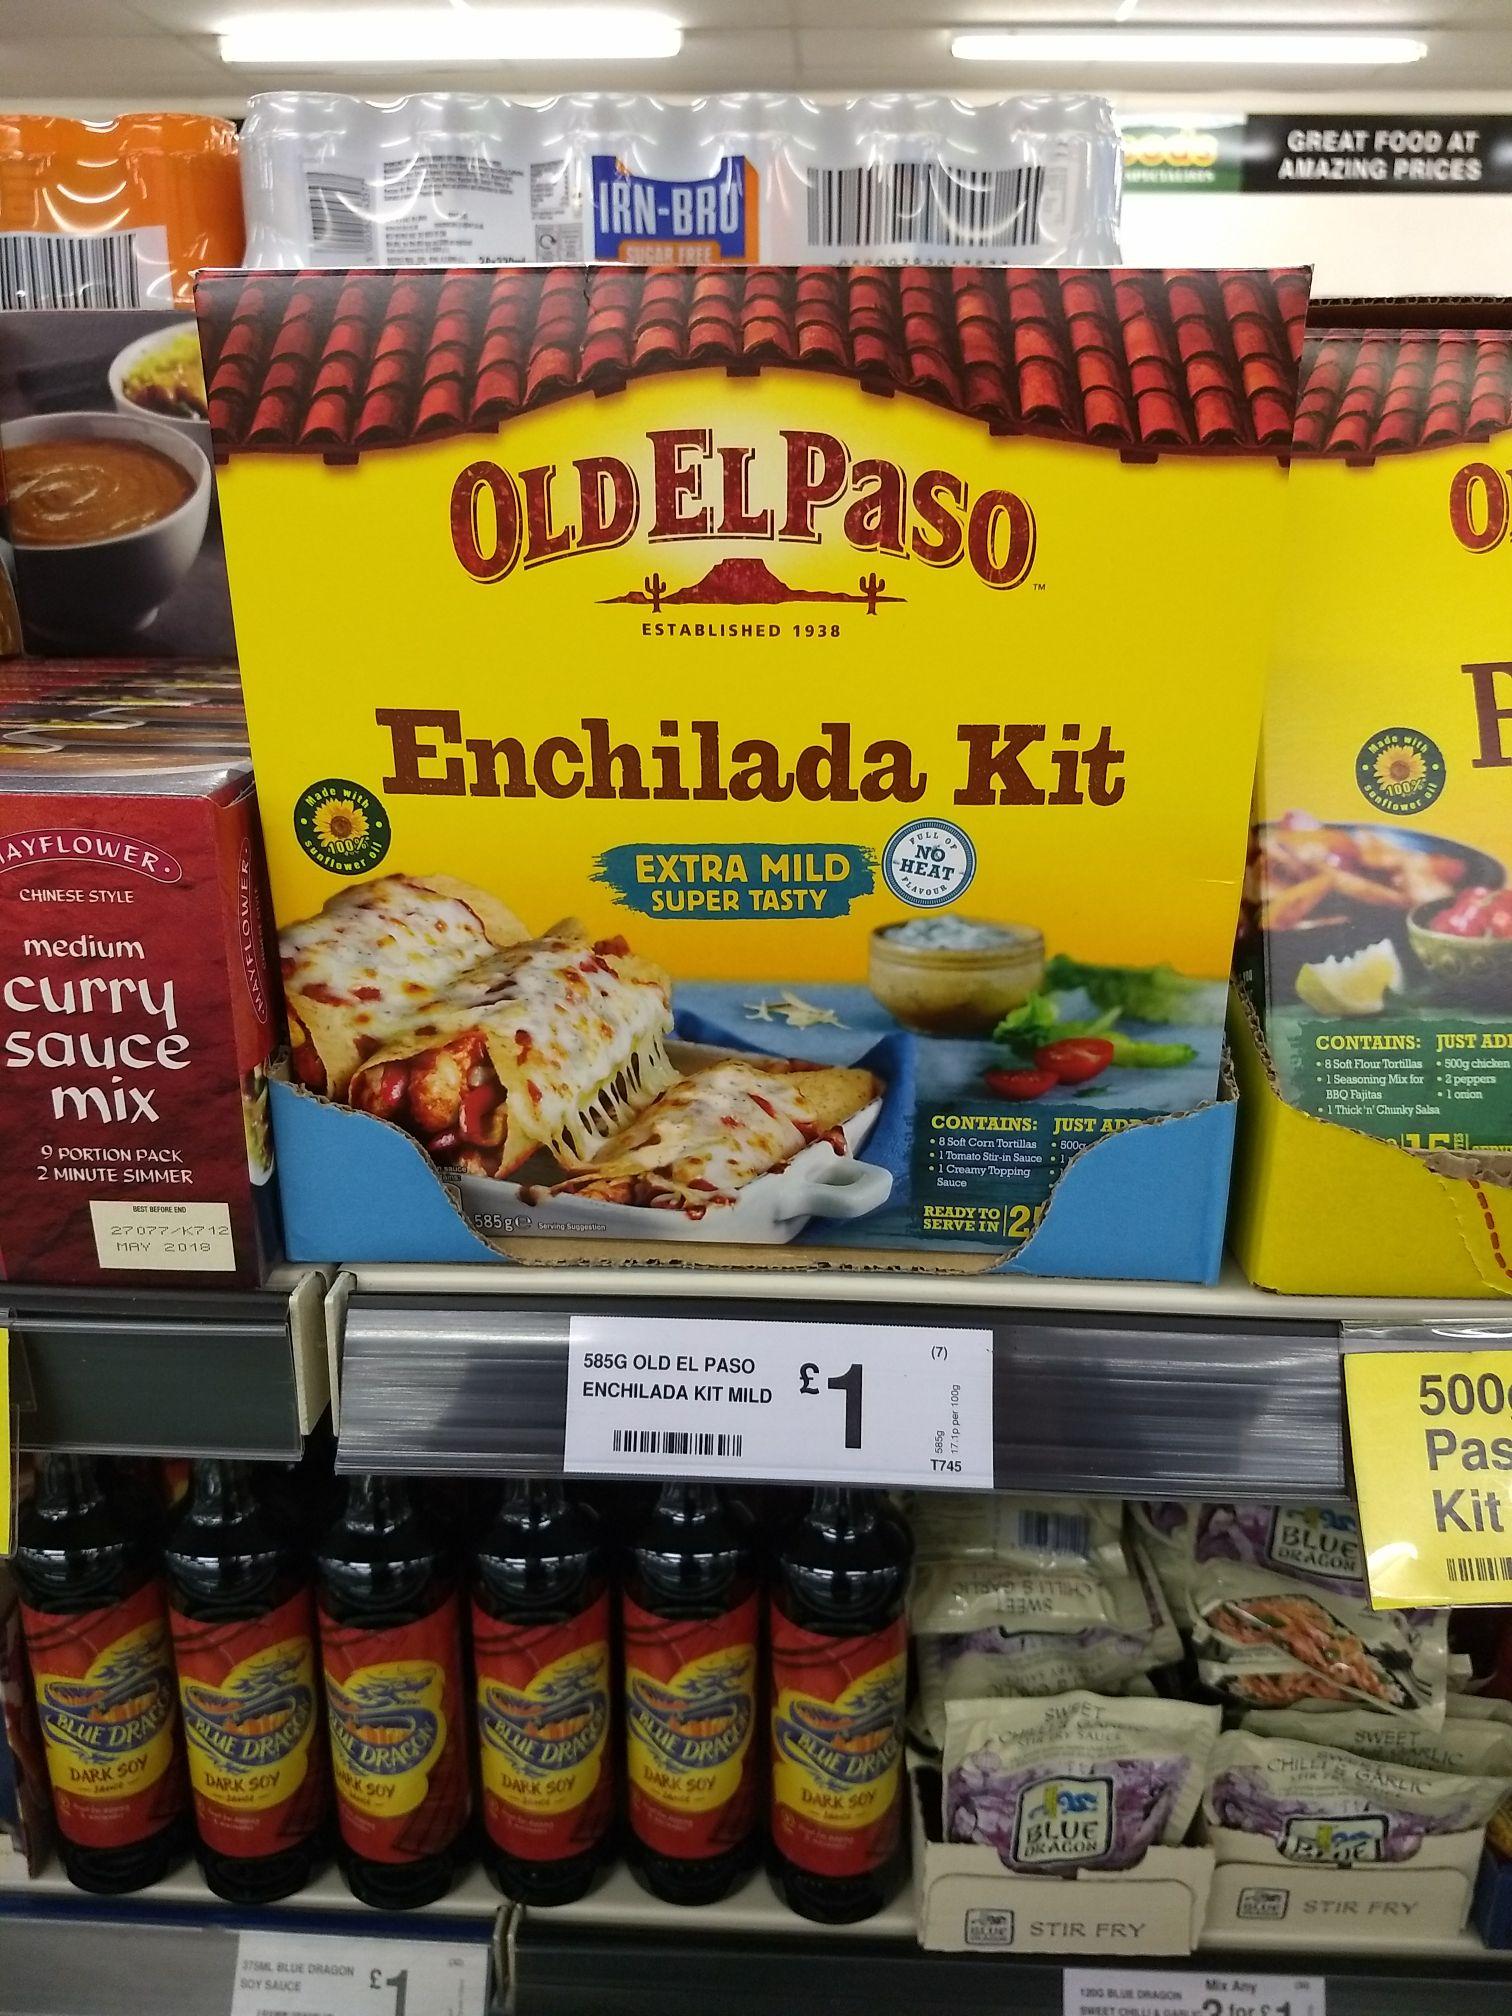 Old El Paso Enchilada Kit £1 instore @ FarmFoods